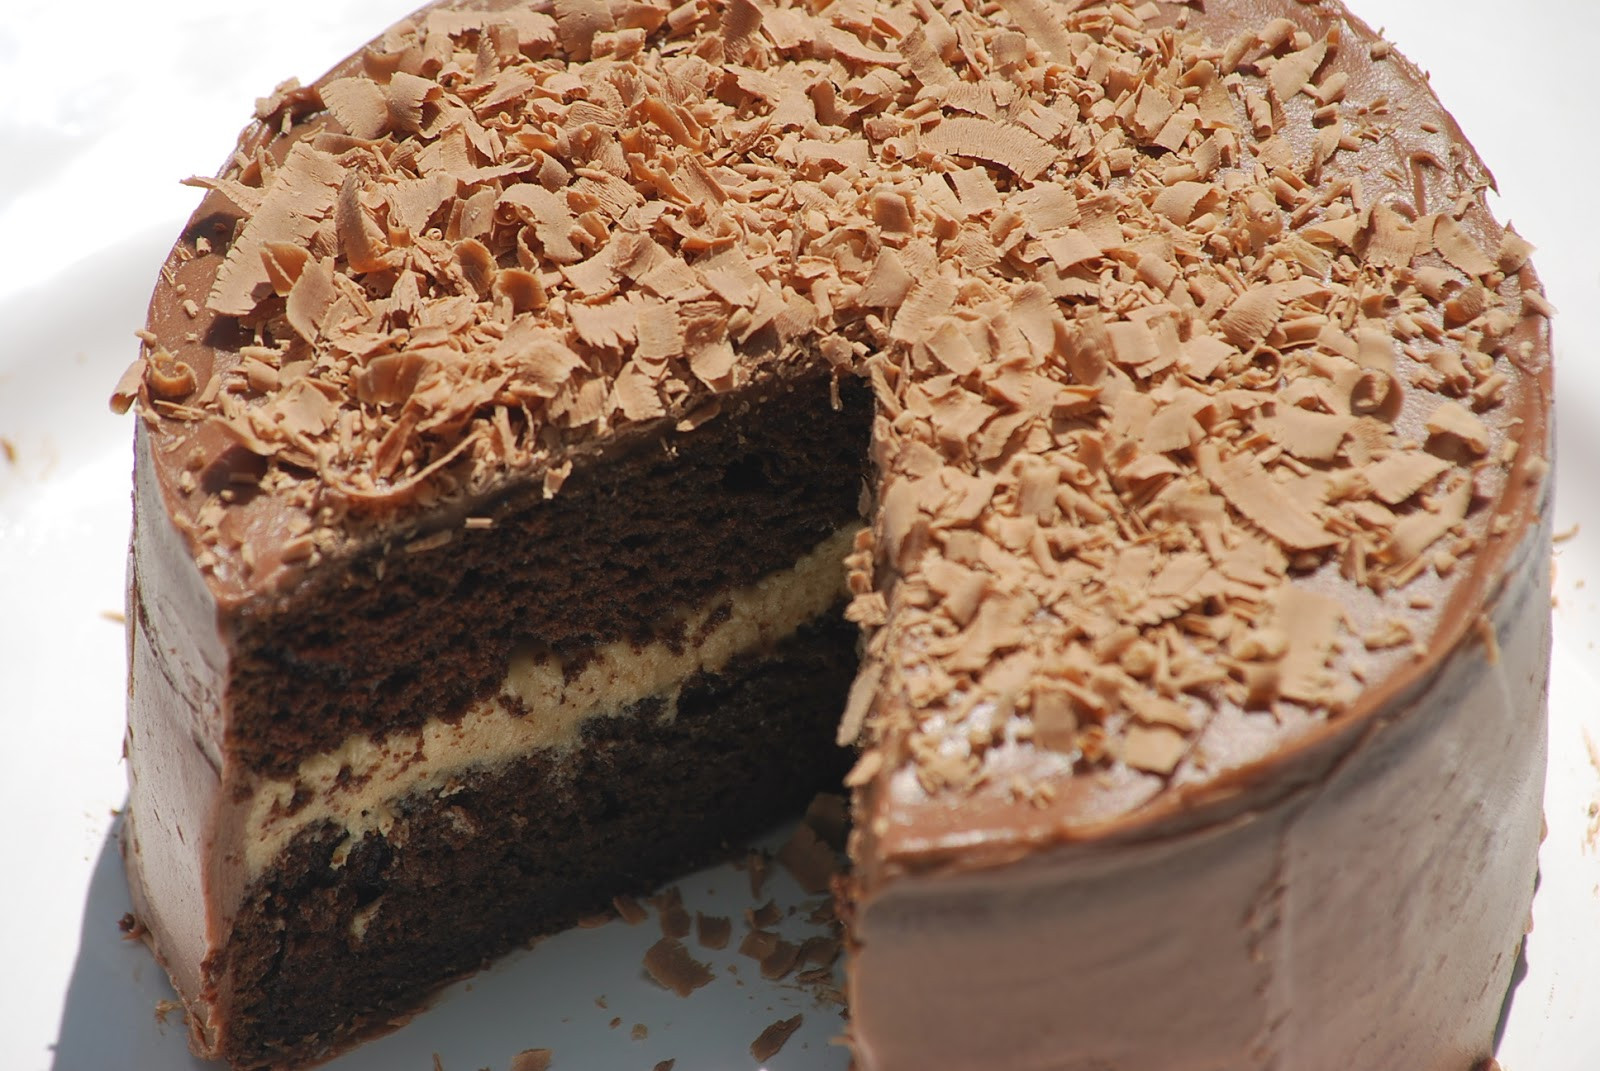 Gluten Free Chocolate Cake Recipe  My story in recipes Gluten Free Chocolate Cake